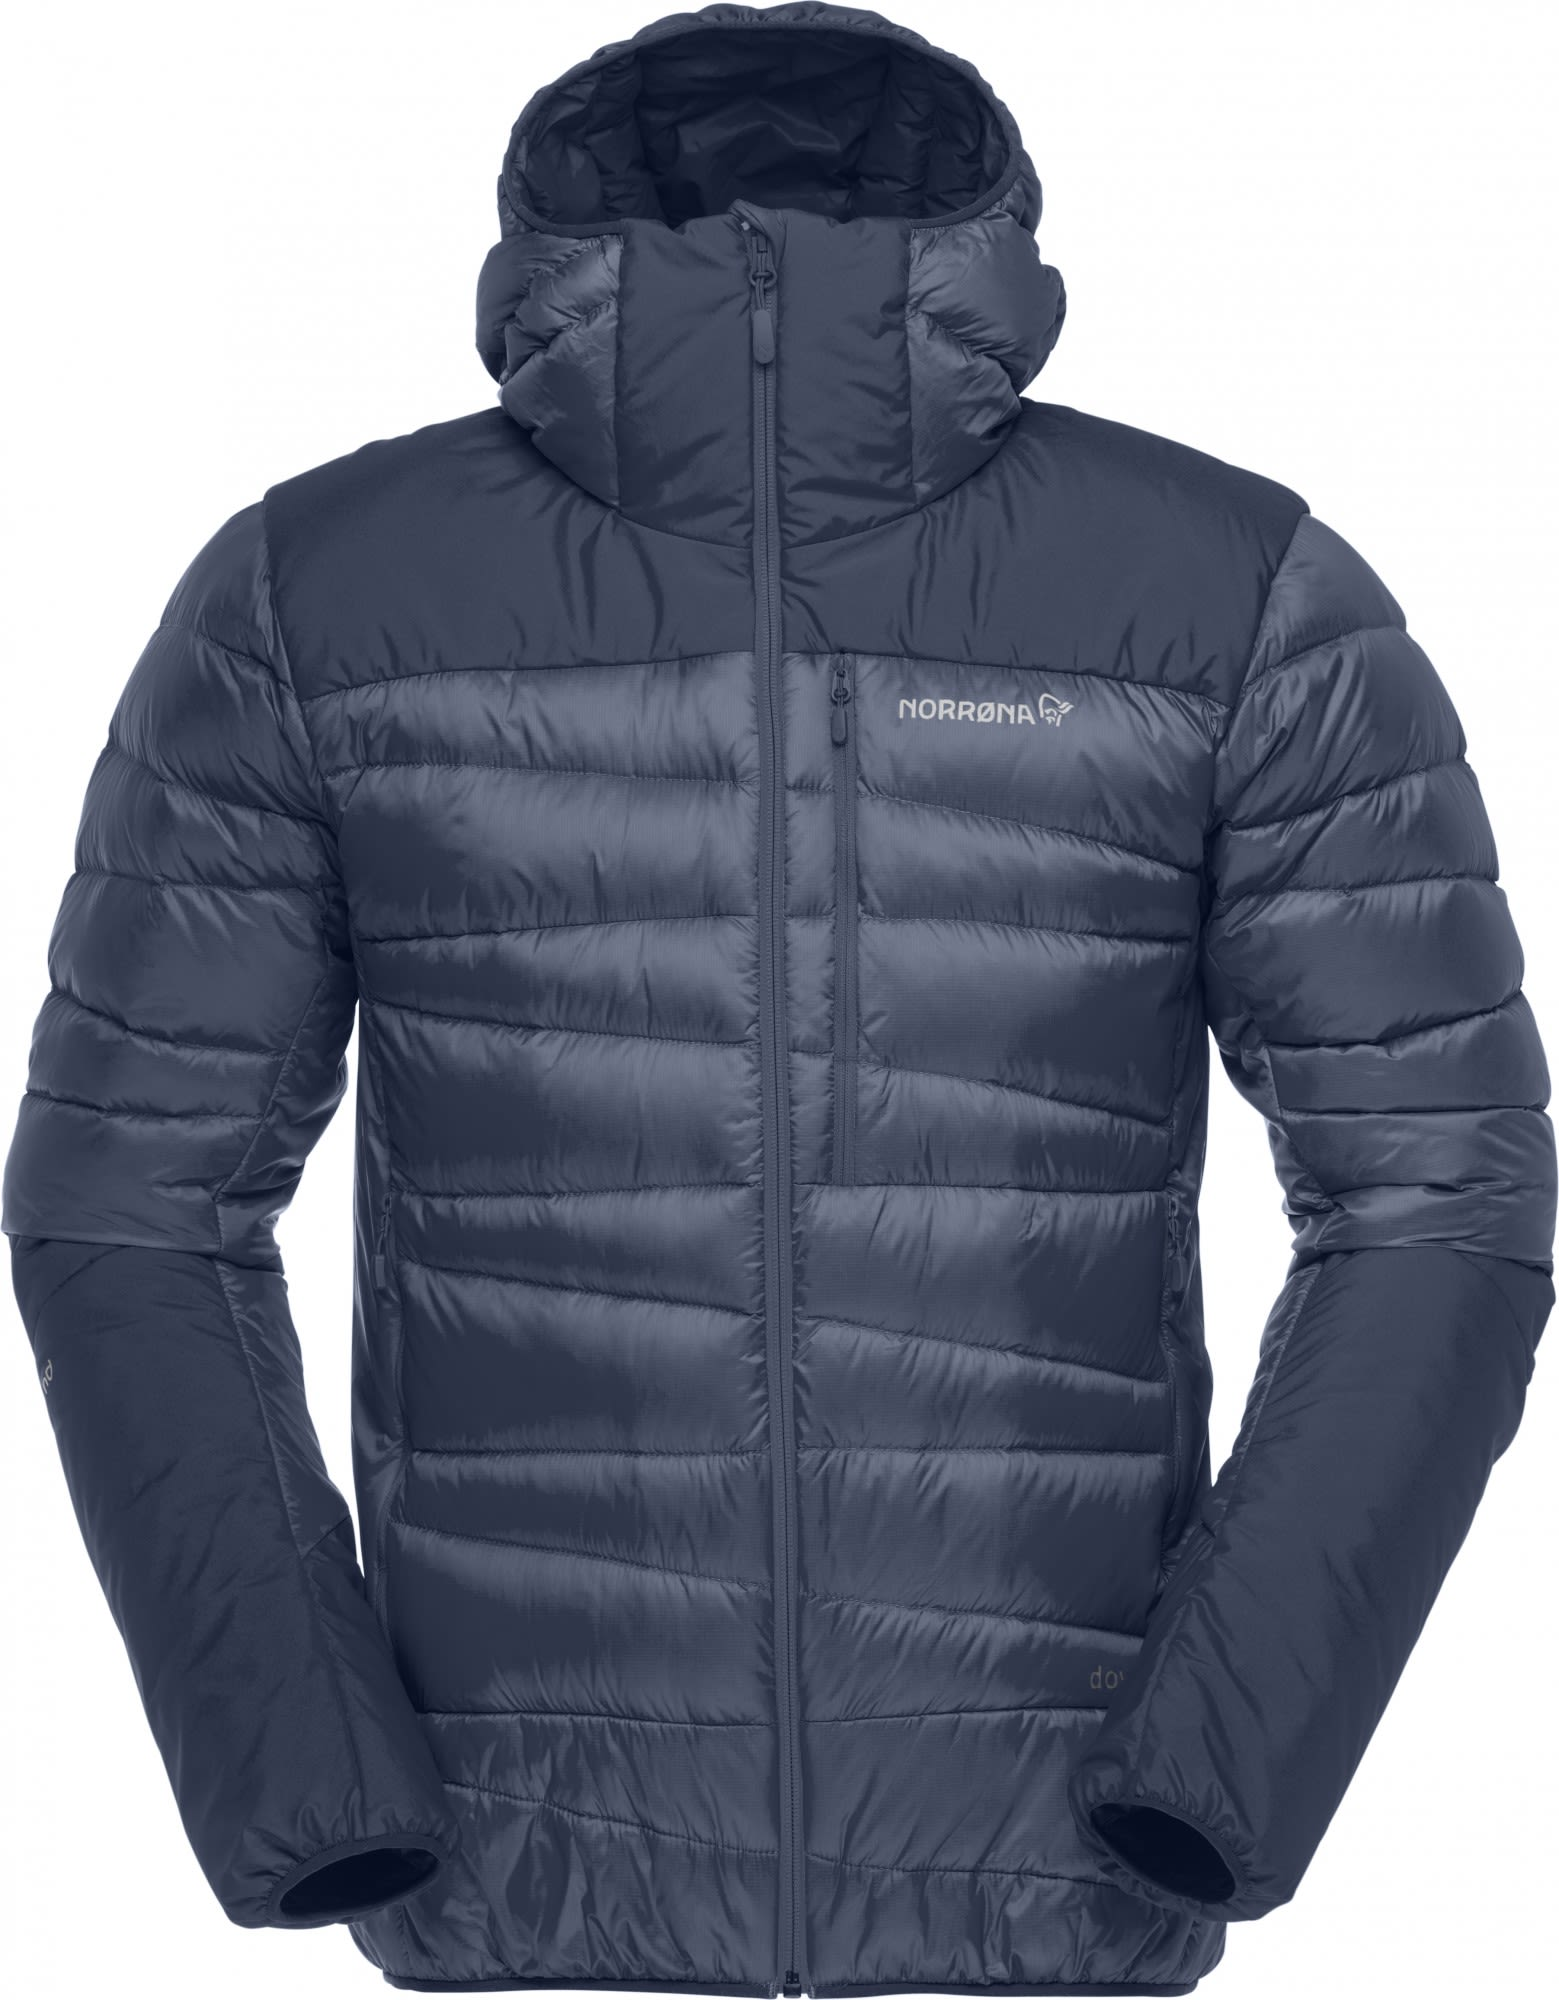 Norrona Falketind Down750 Hood Jacket Blau, Male Daunen L -Farbe Indigo Night, L